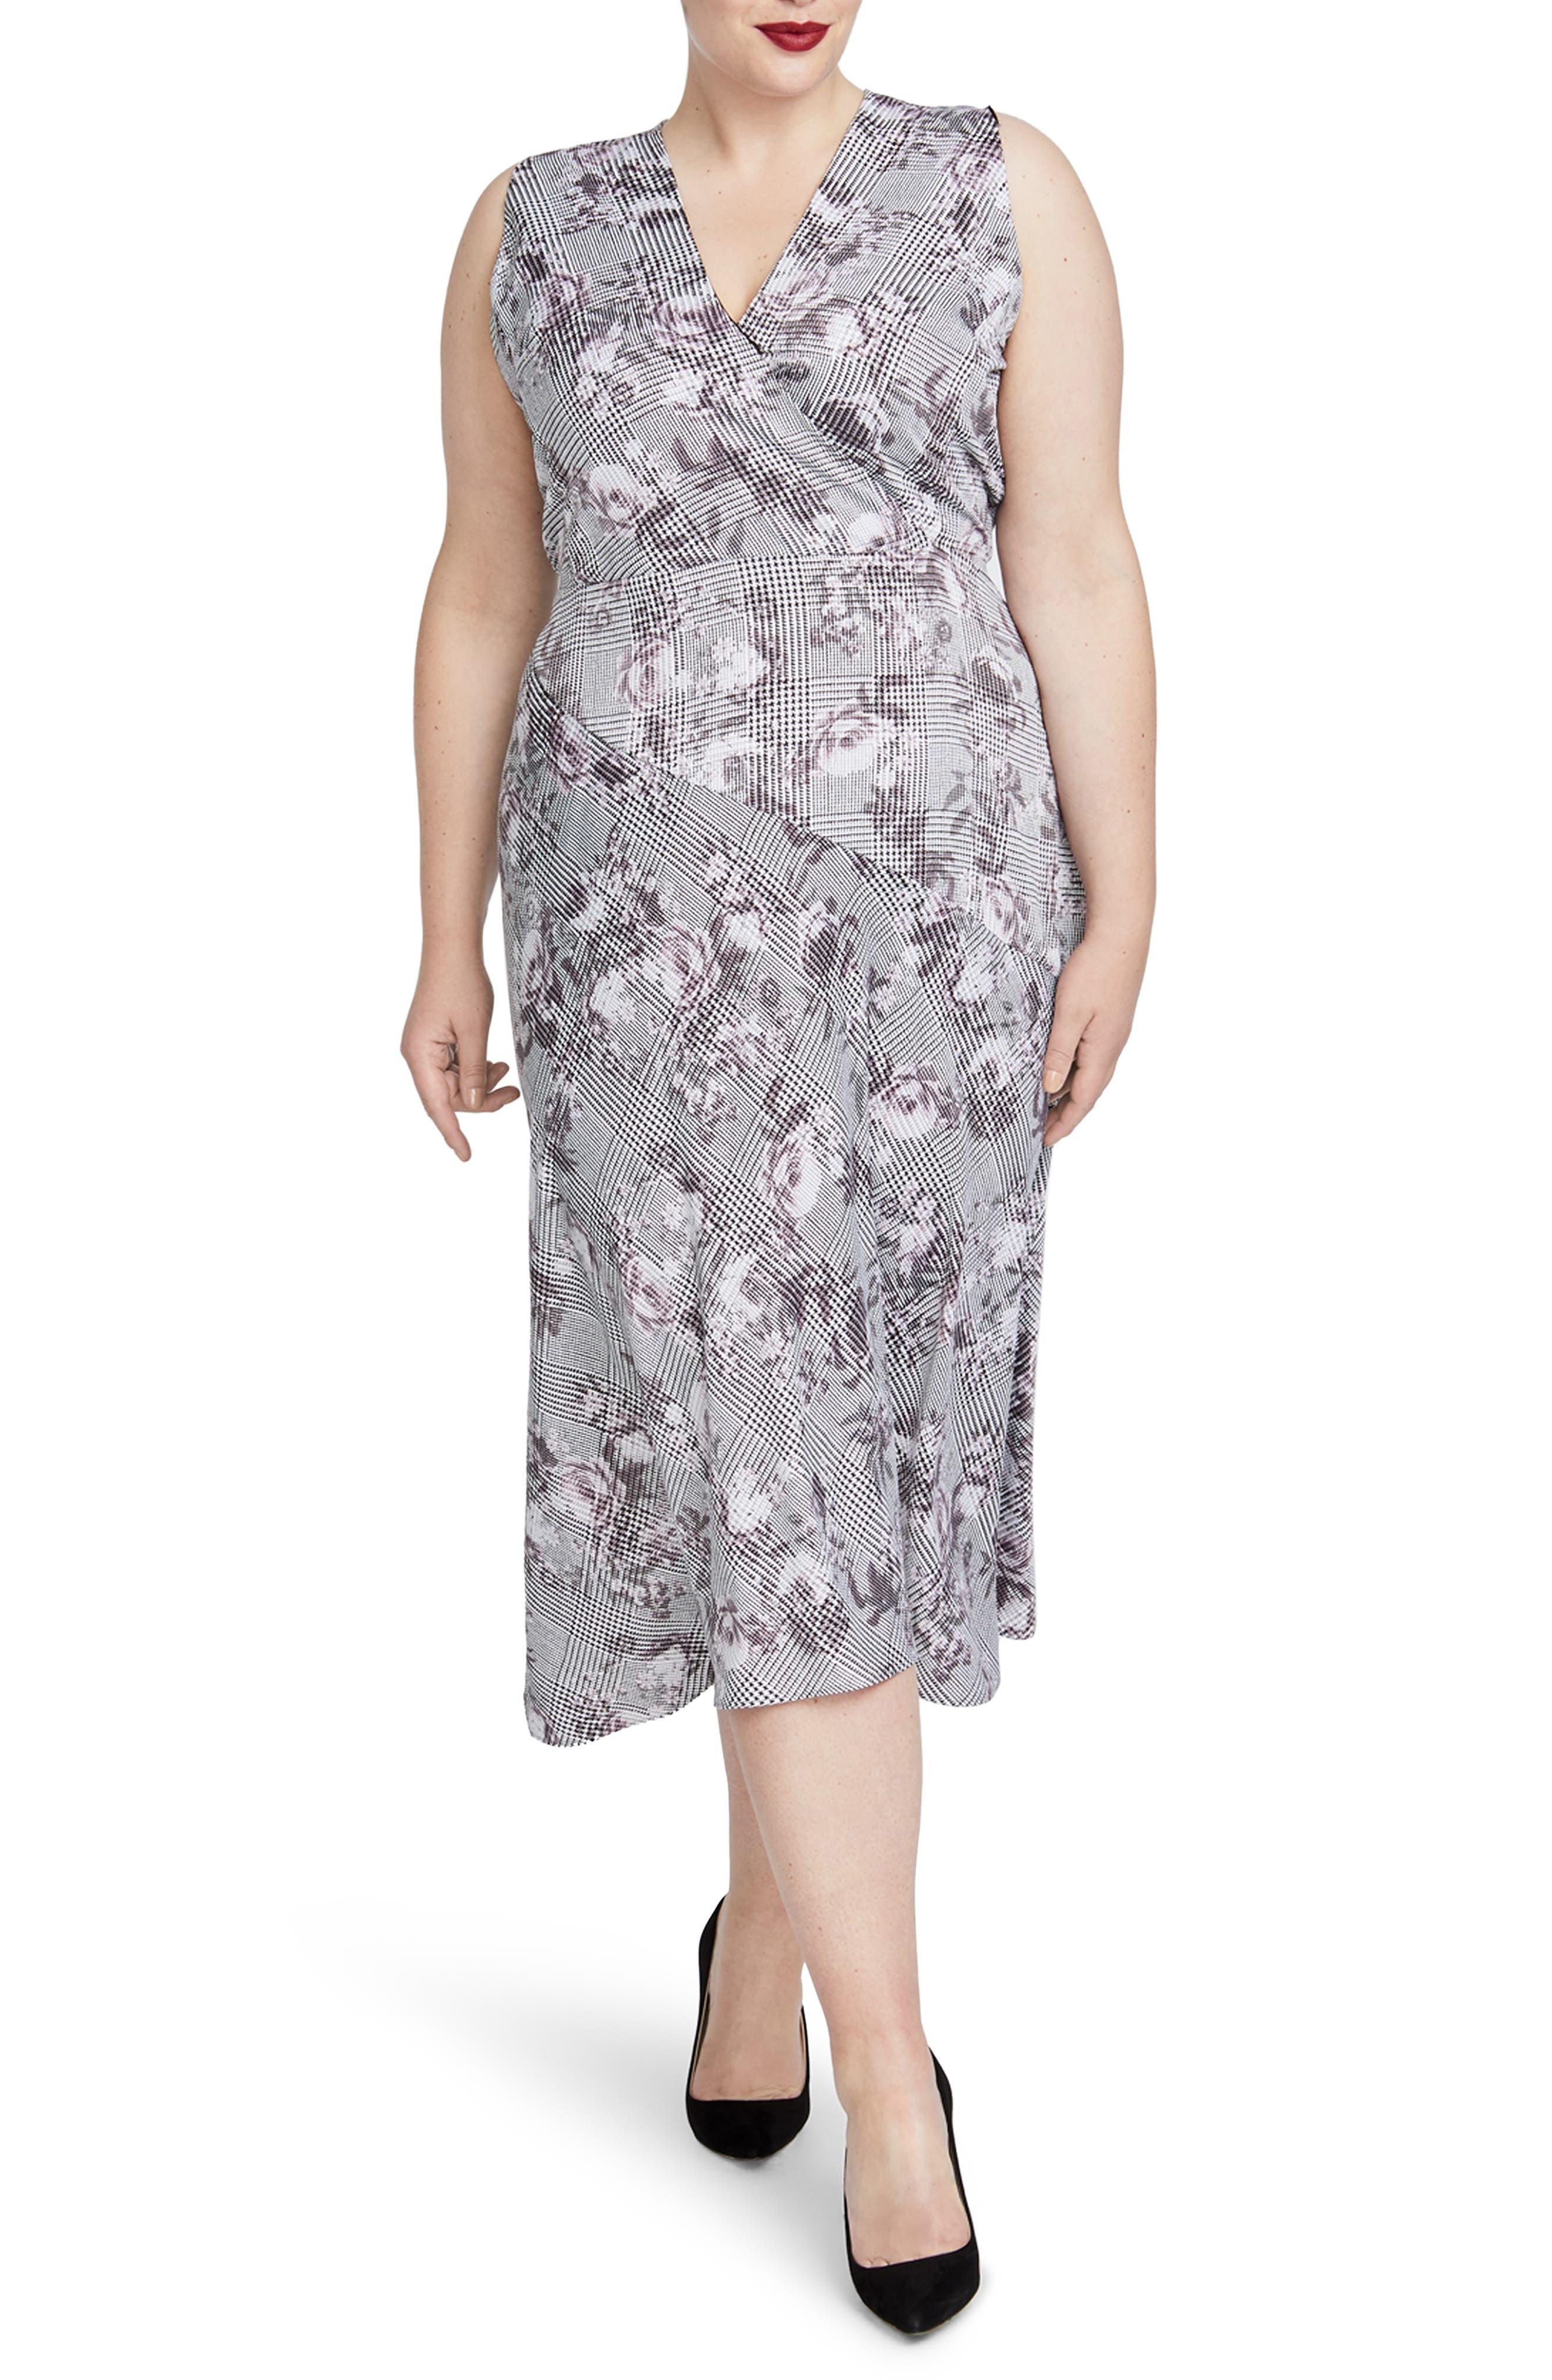 Plus Size Rachel Rachel Roy Giles Dress, Grey